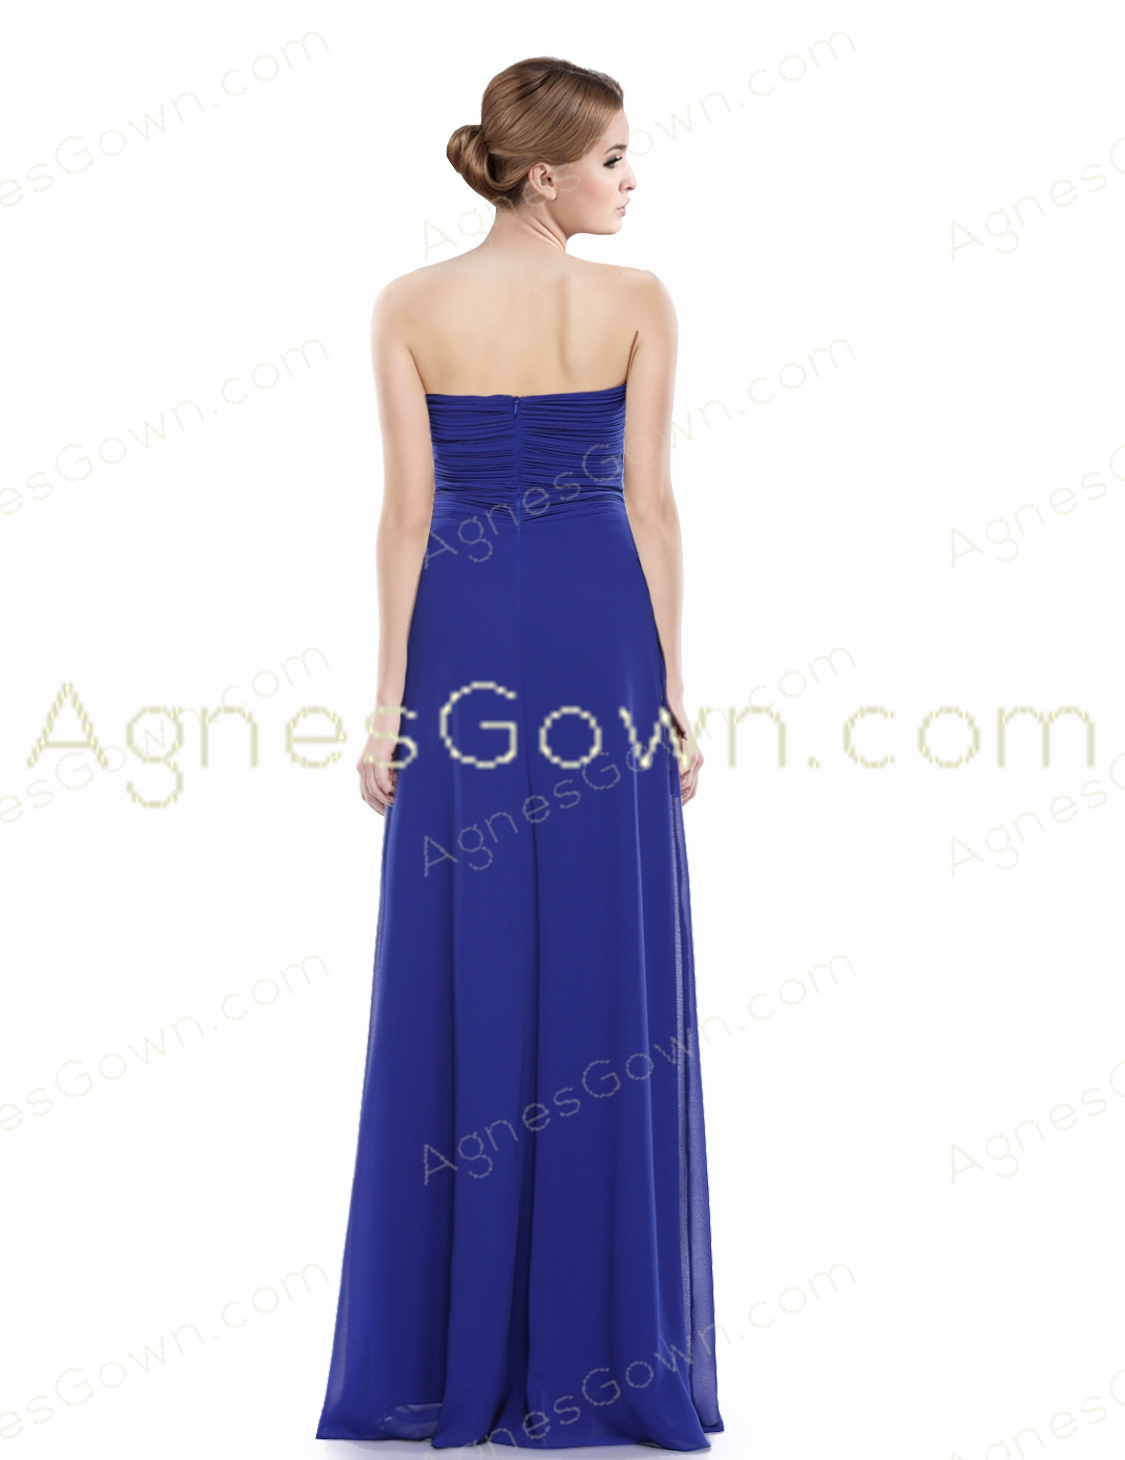 Top Halter Royal Blue Chiffon Long Prom Dress